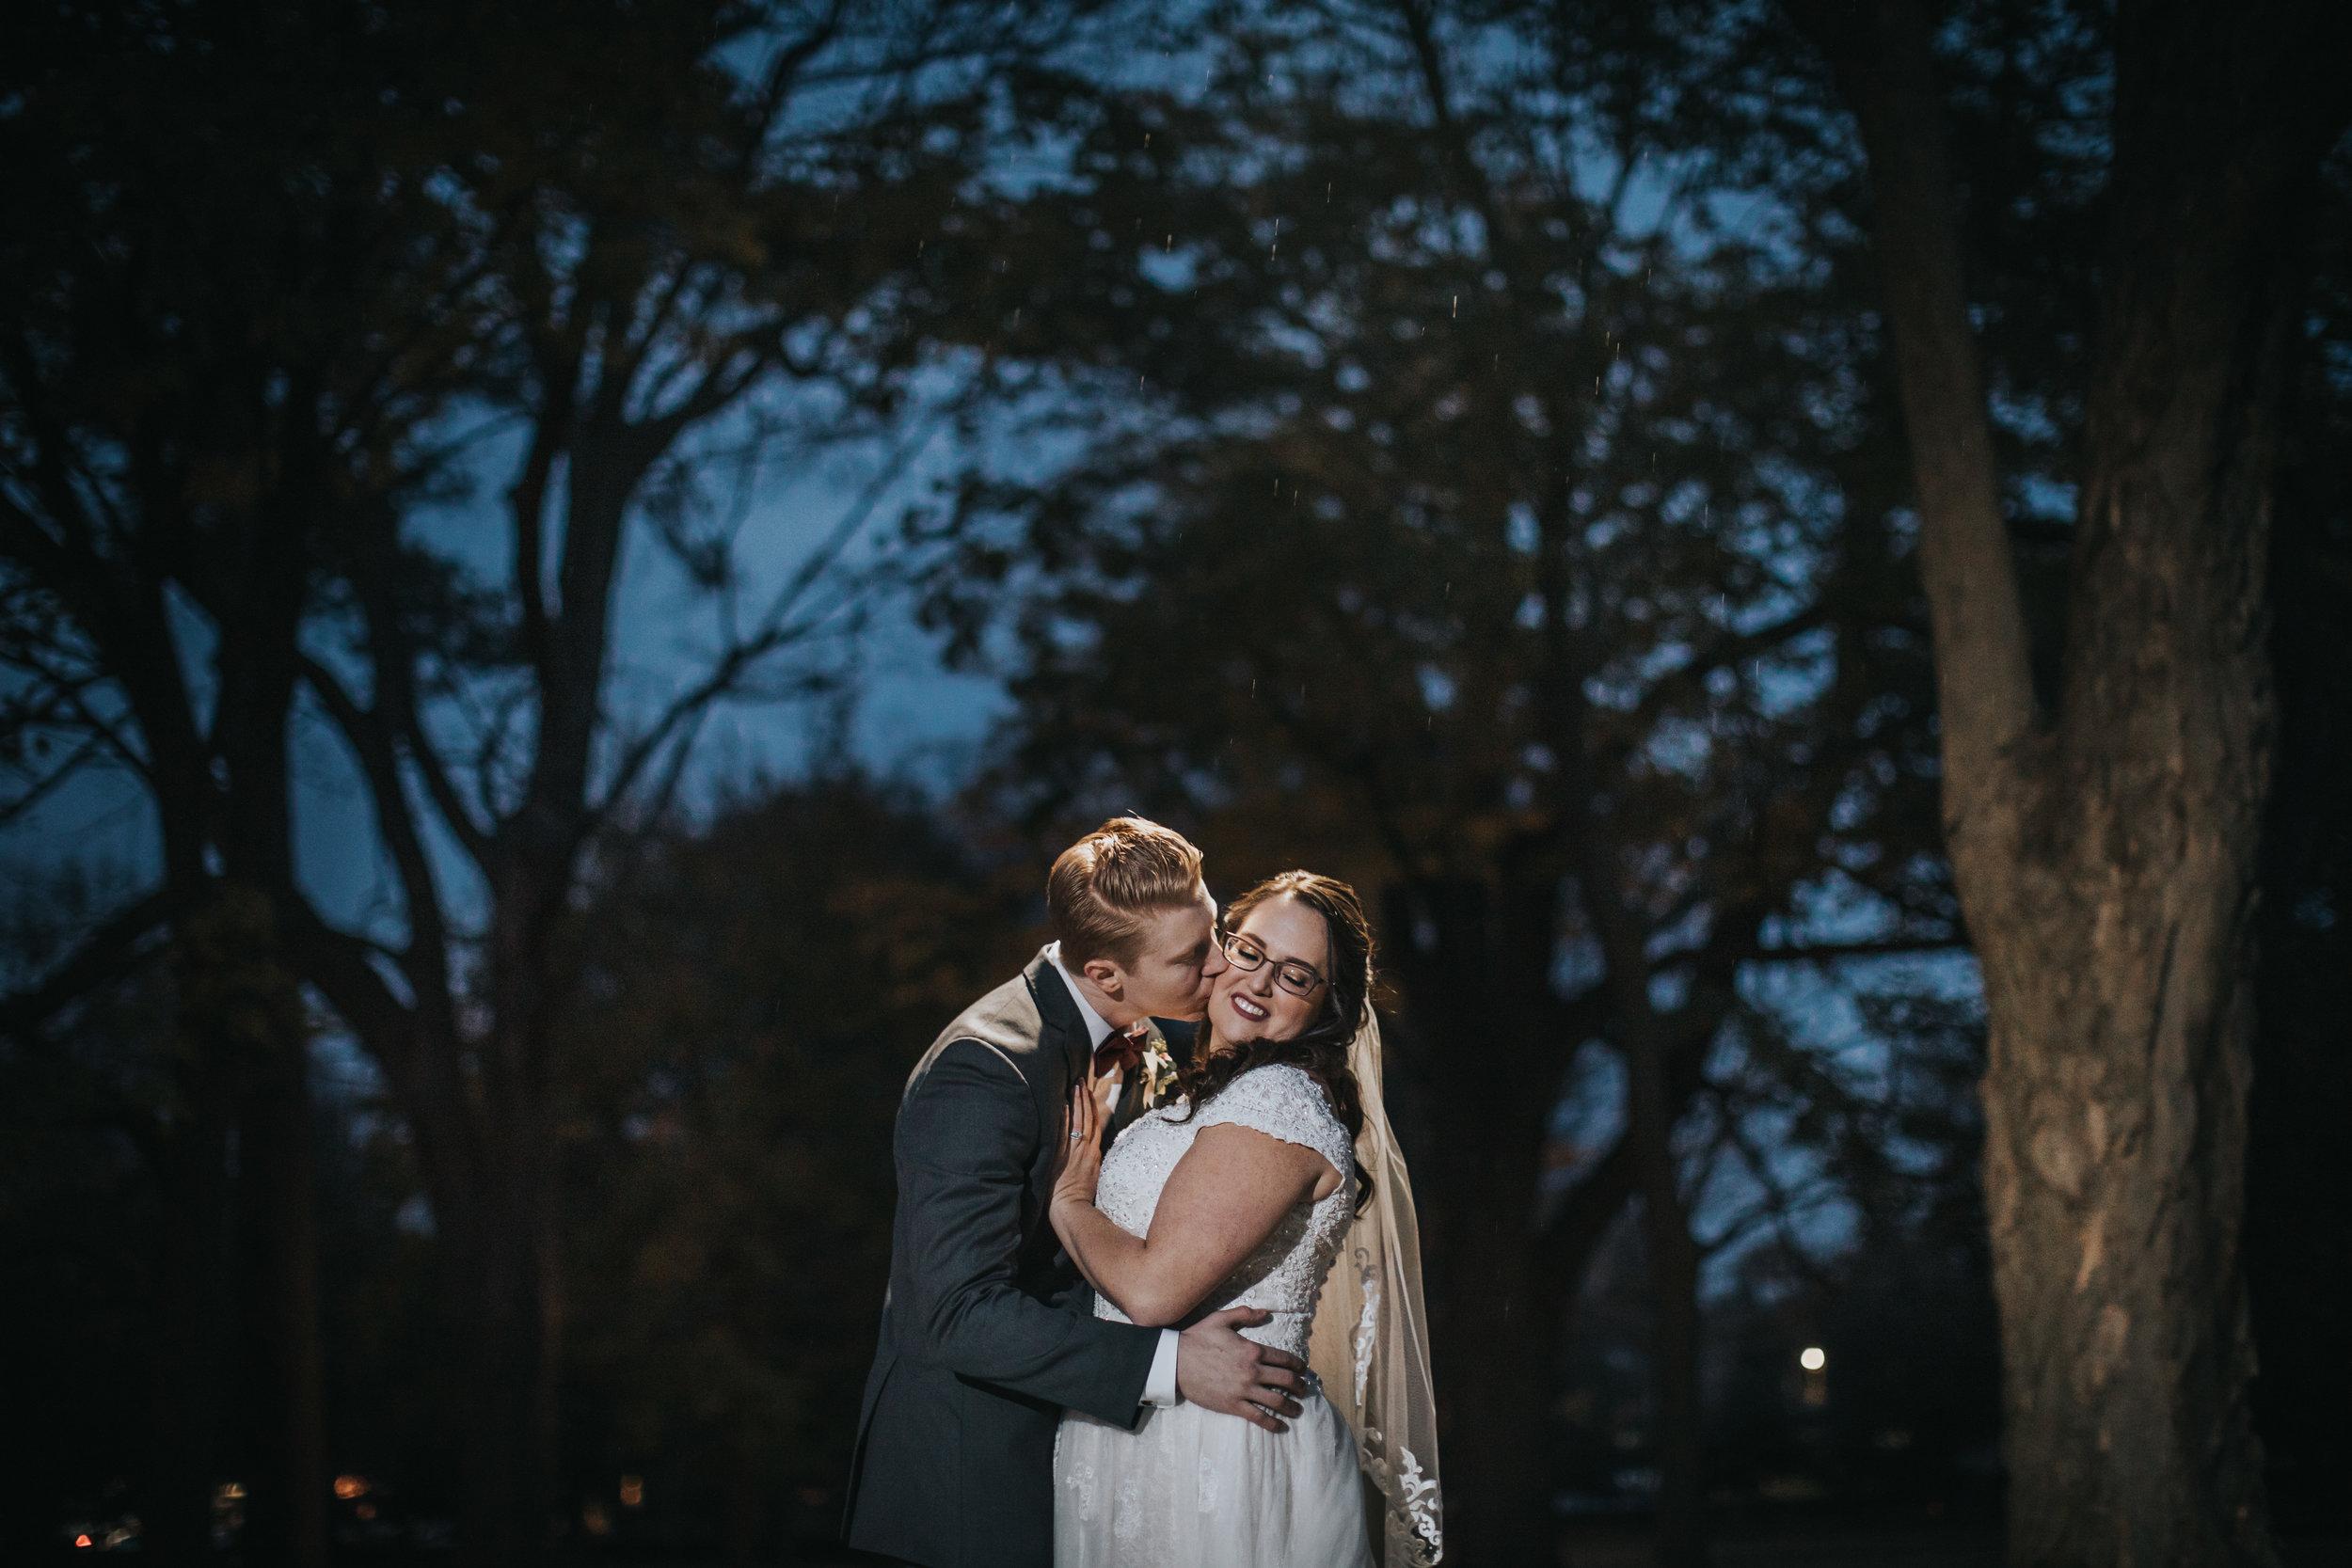 New-Jersey-Wedding-Photography-Fishers-Tudor-House-JennaLynnPhotography-Bride&Groom-Kathleen&Eddie-7.jpg